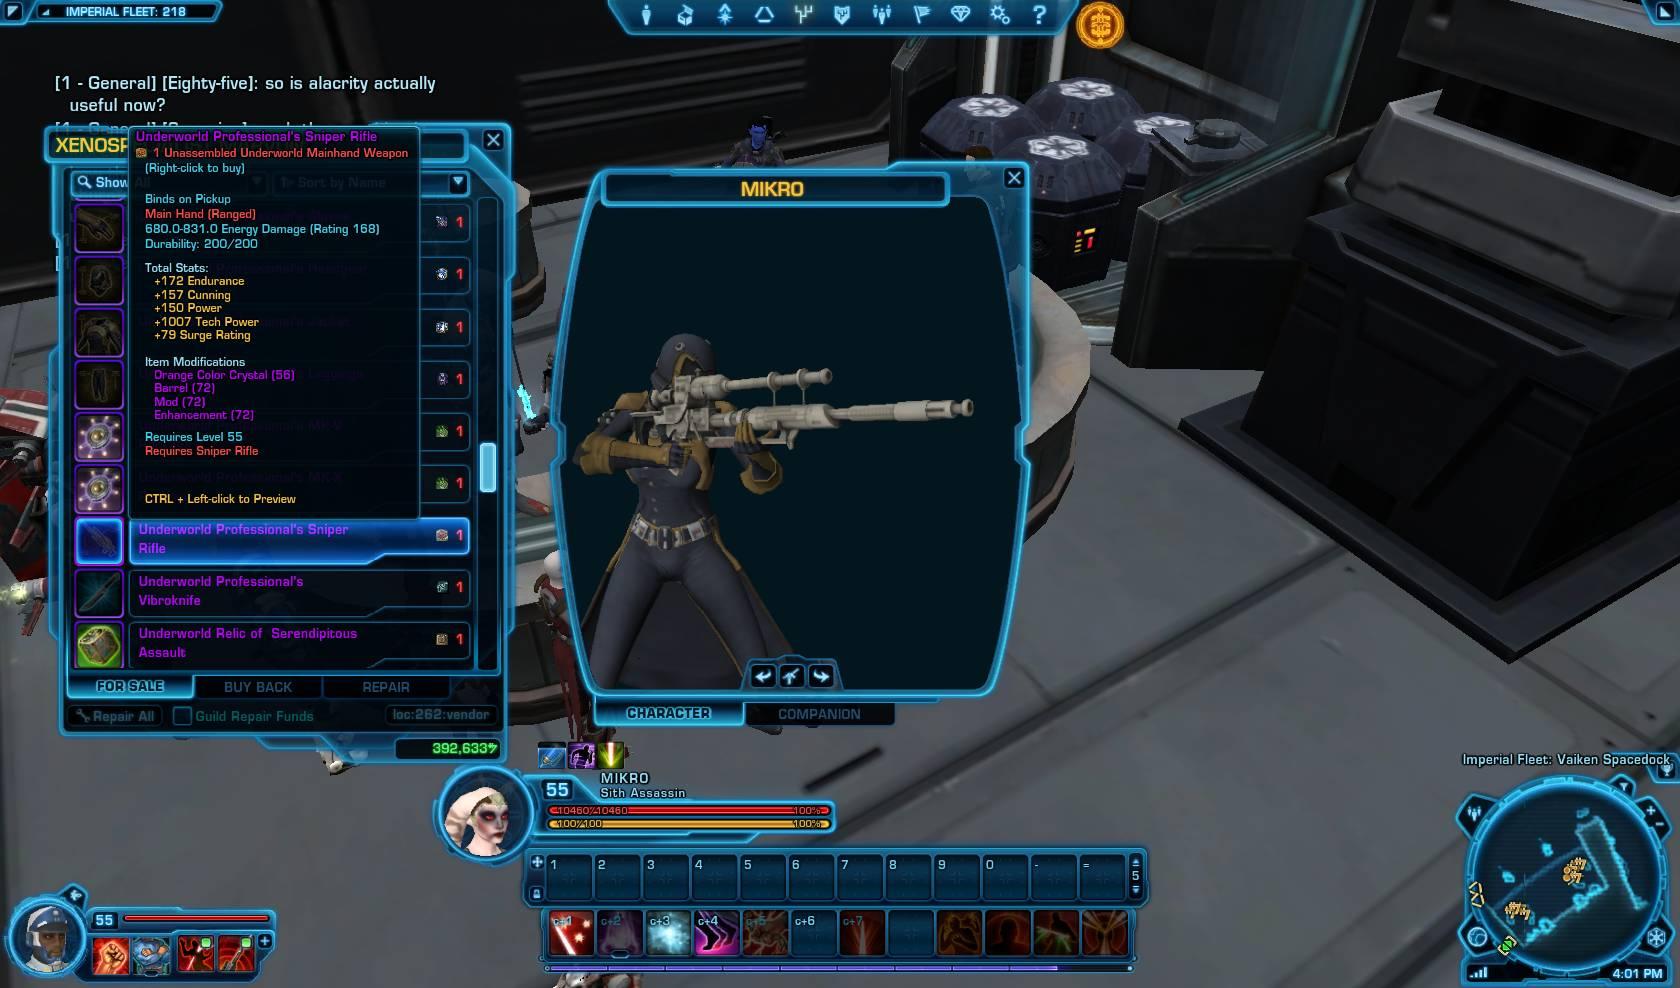 swtor underworld professional sniper rifle